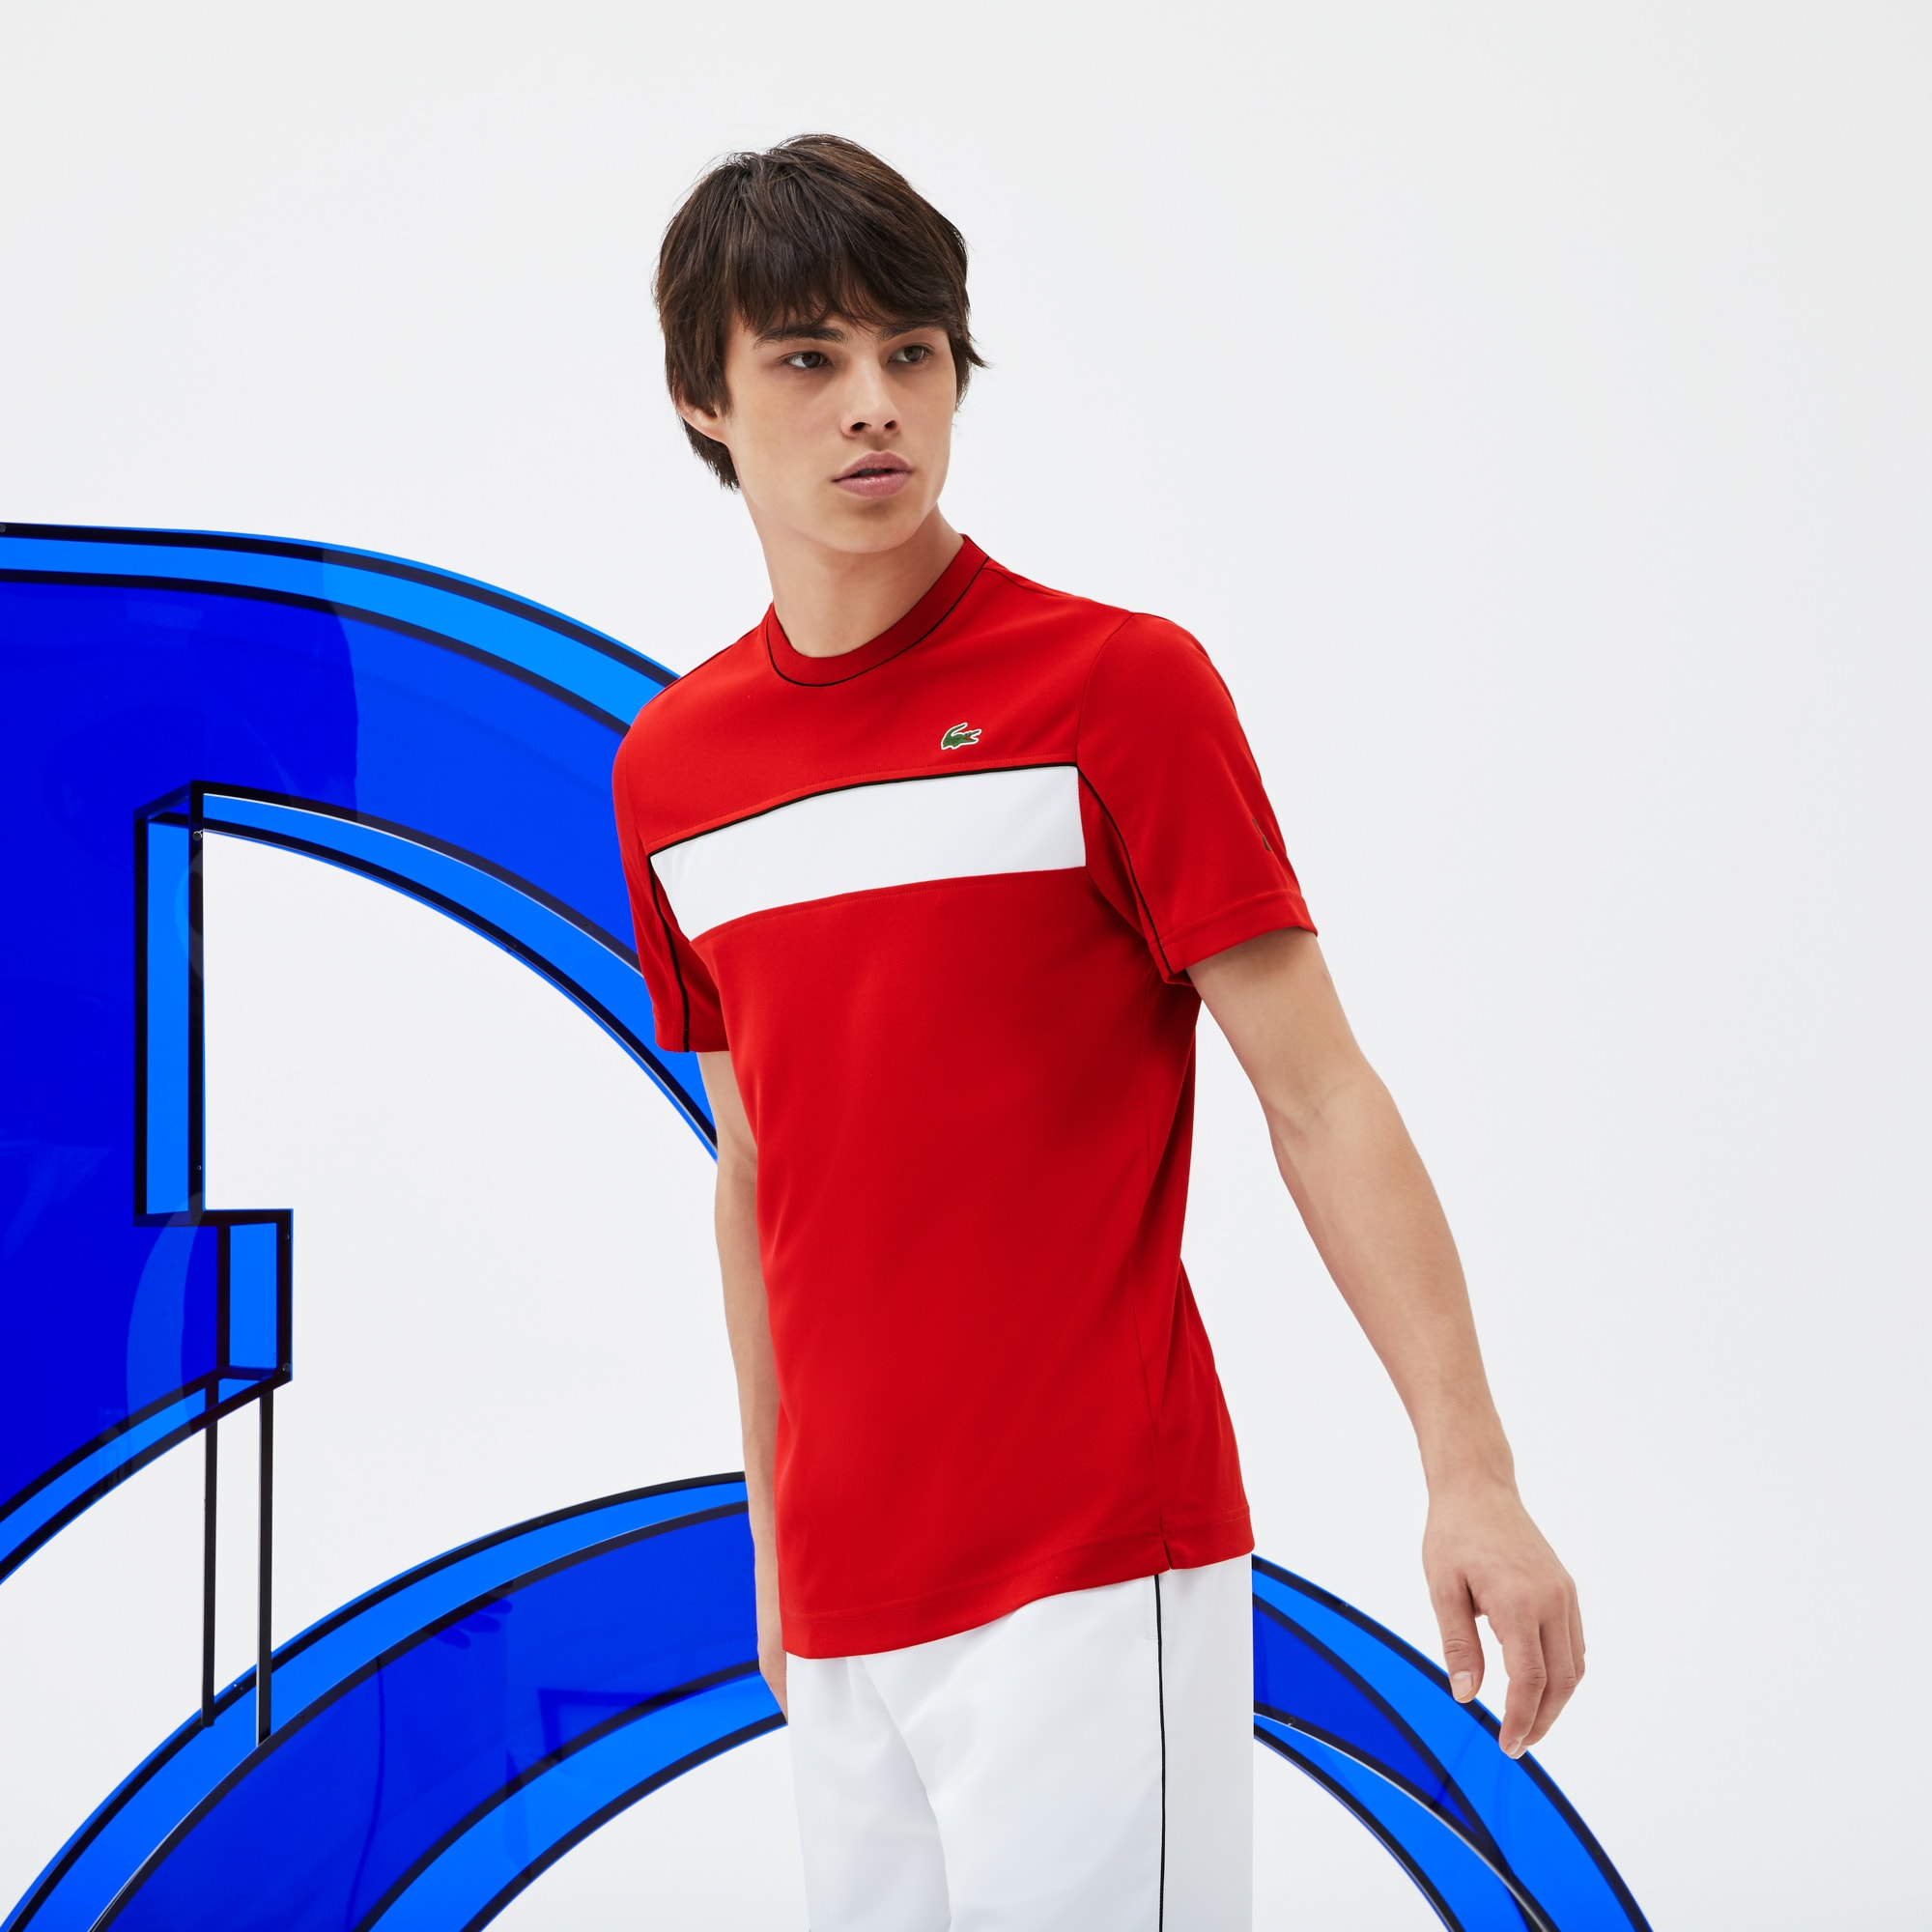 Men's SPORT Colorblock Tech Piqué T-shirt - x Novak Djokovic